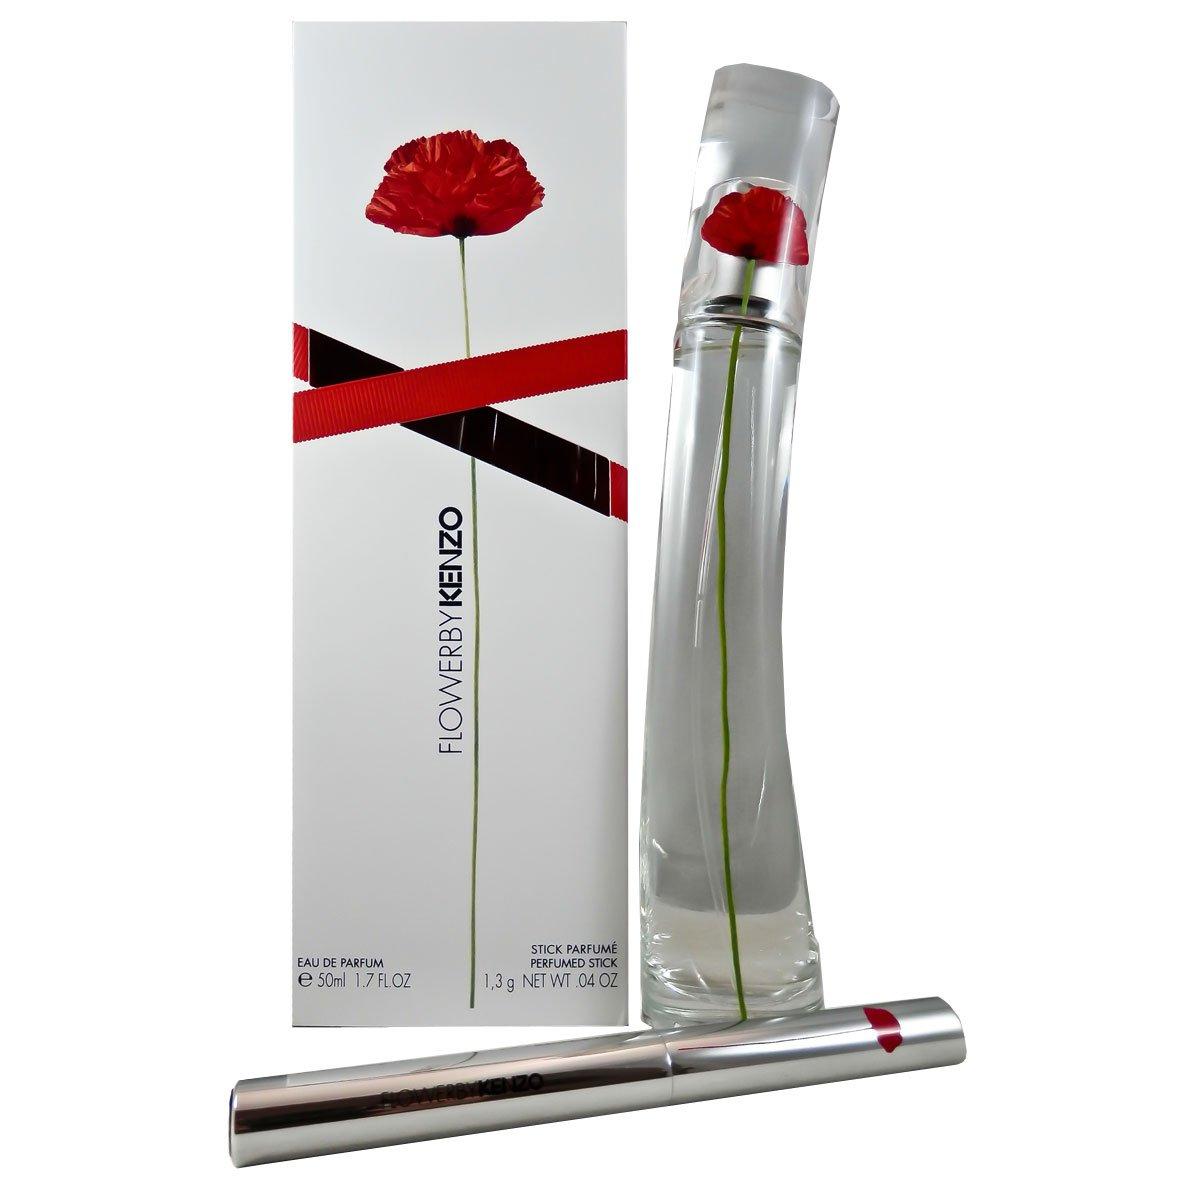 Kenzo Flower Femme/Woman Set (Eau de Parfum, 50ML + PROFUMO Stiff 1.3G), 1er Pack 3274872337442